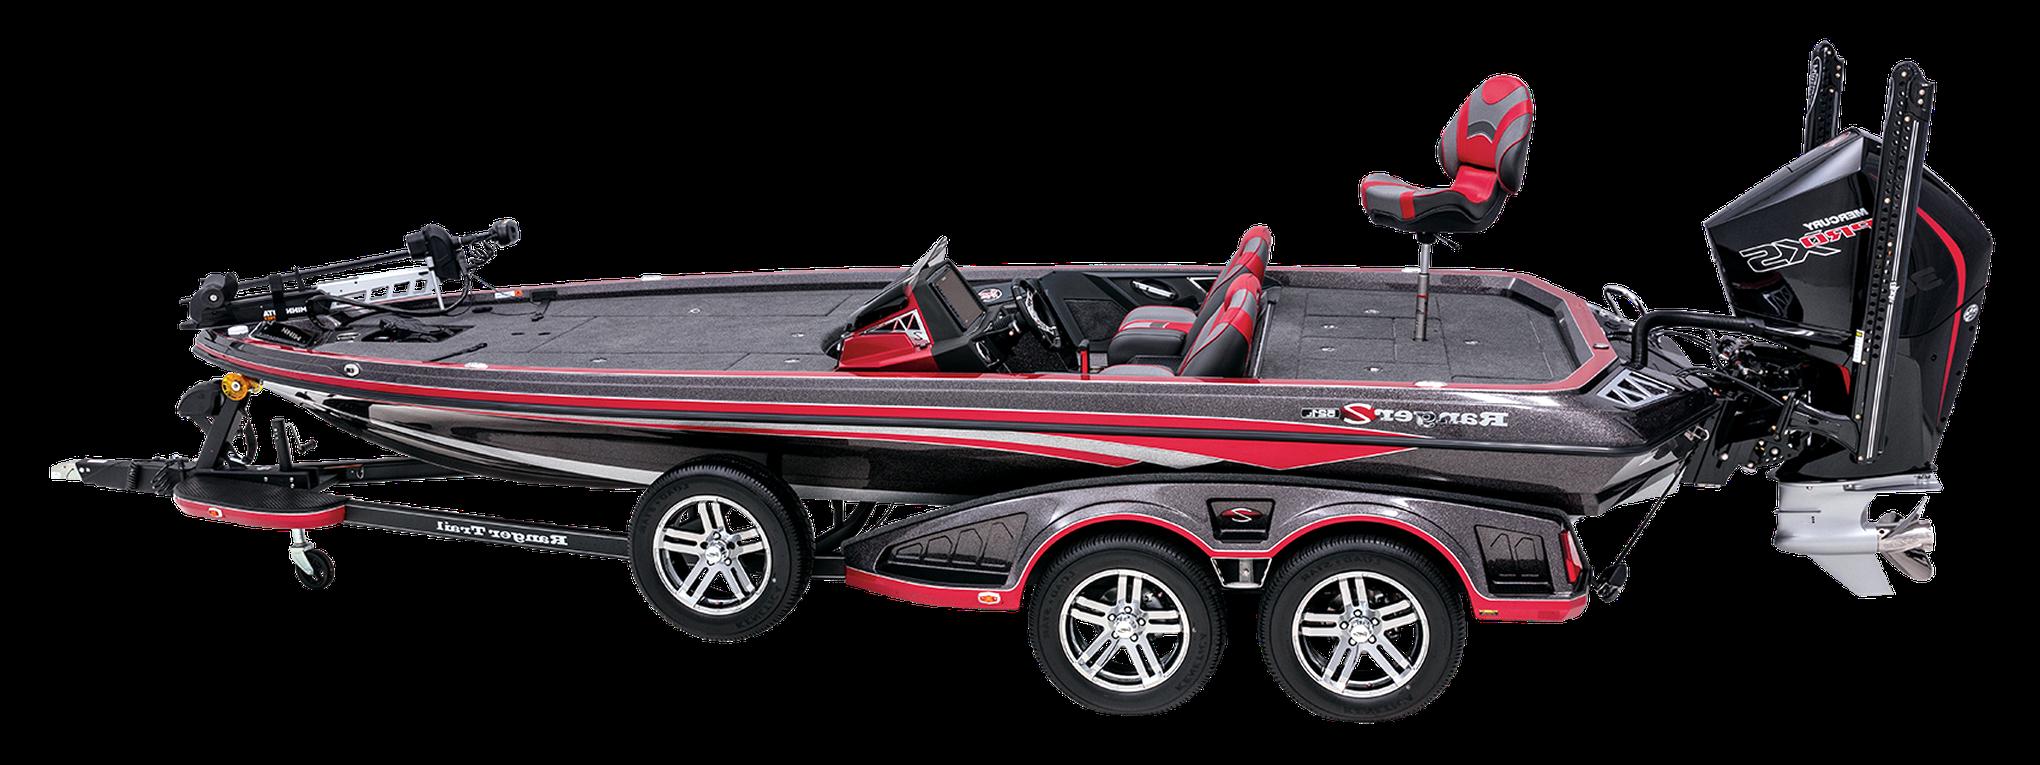 Ranger Bass Boat For Sale Only 3 Left At 60